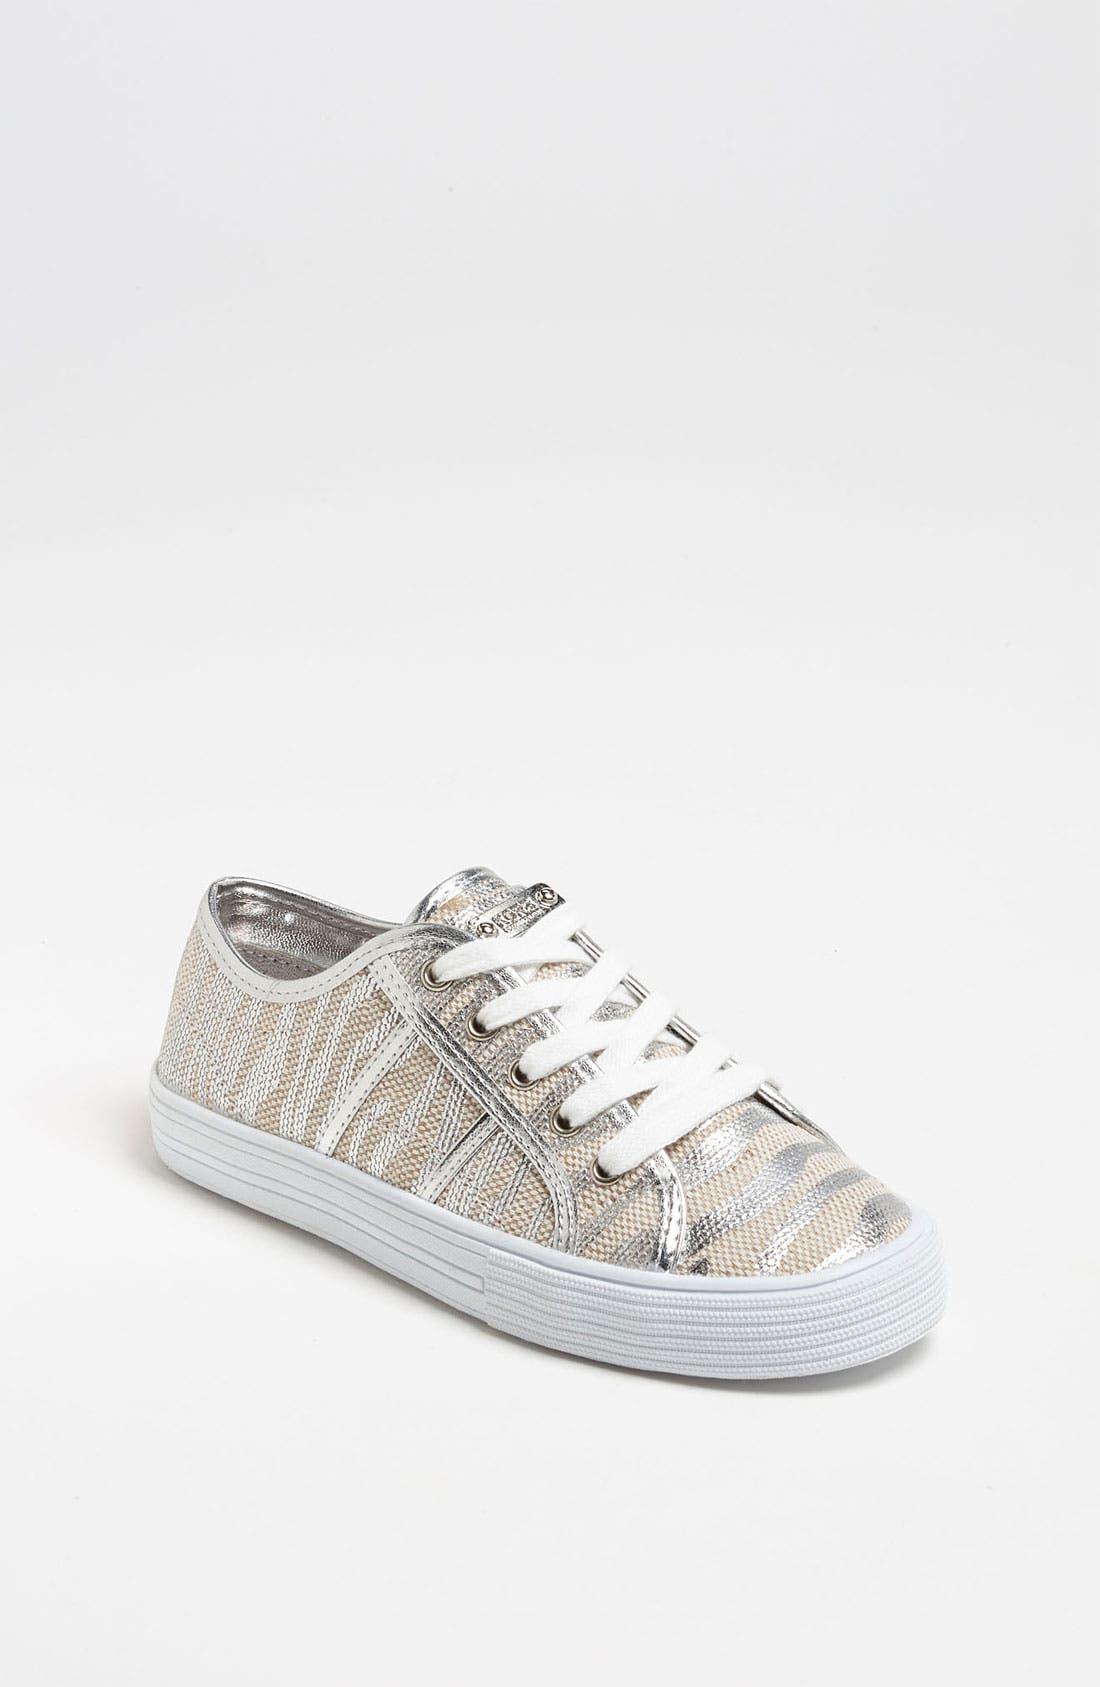 Main Image - KORS Michael Kors 'Snapdragon' Sneaker (Toddler, Little Kid & Big Kid)